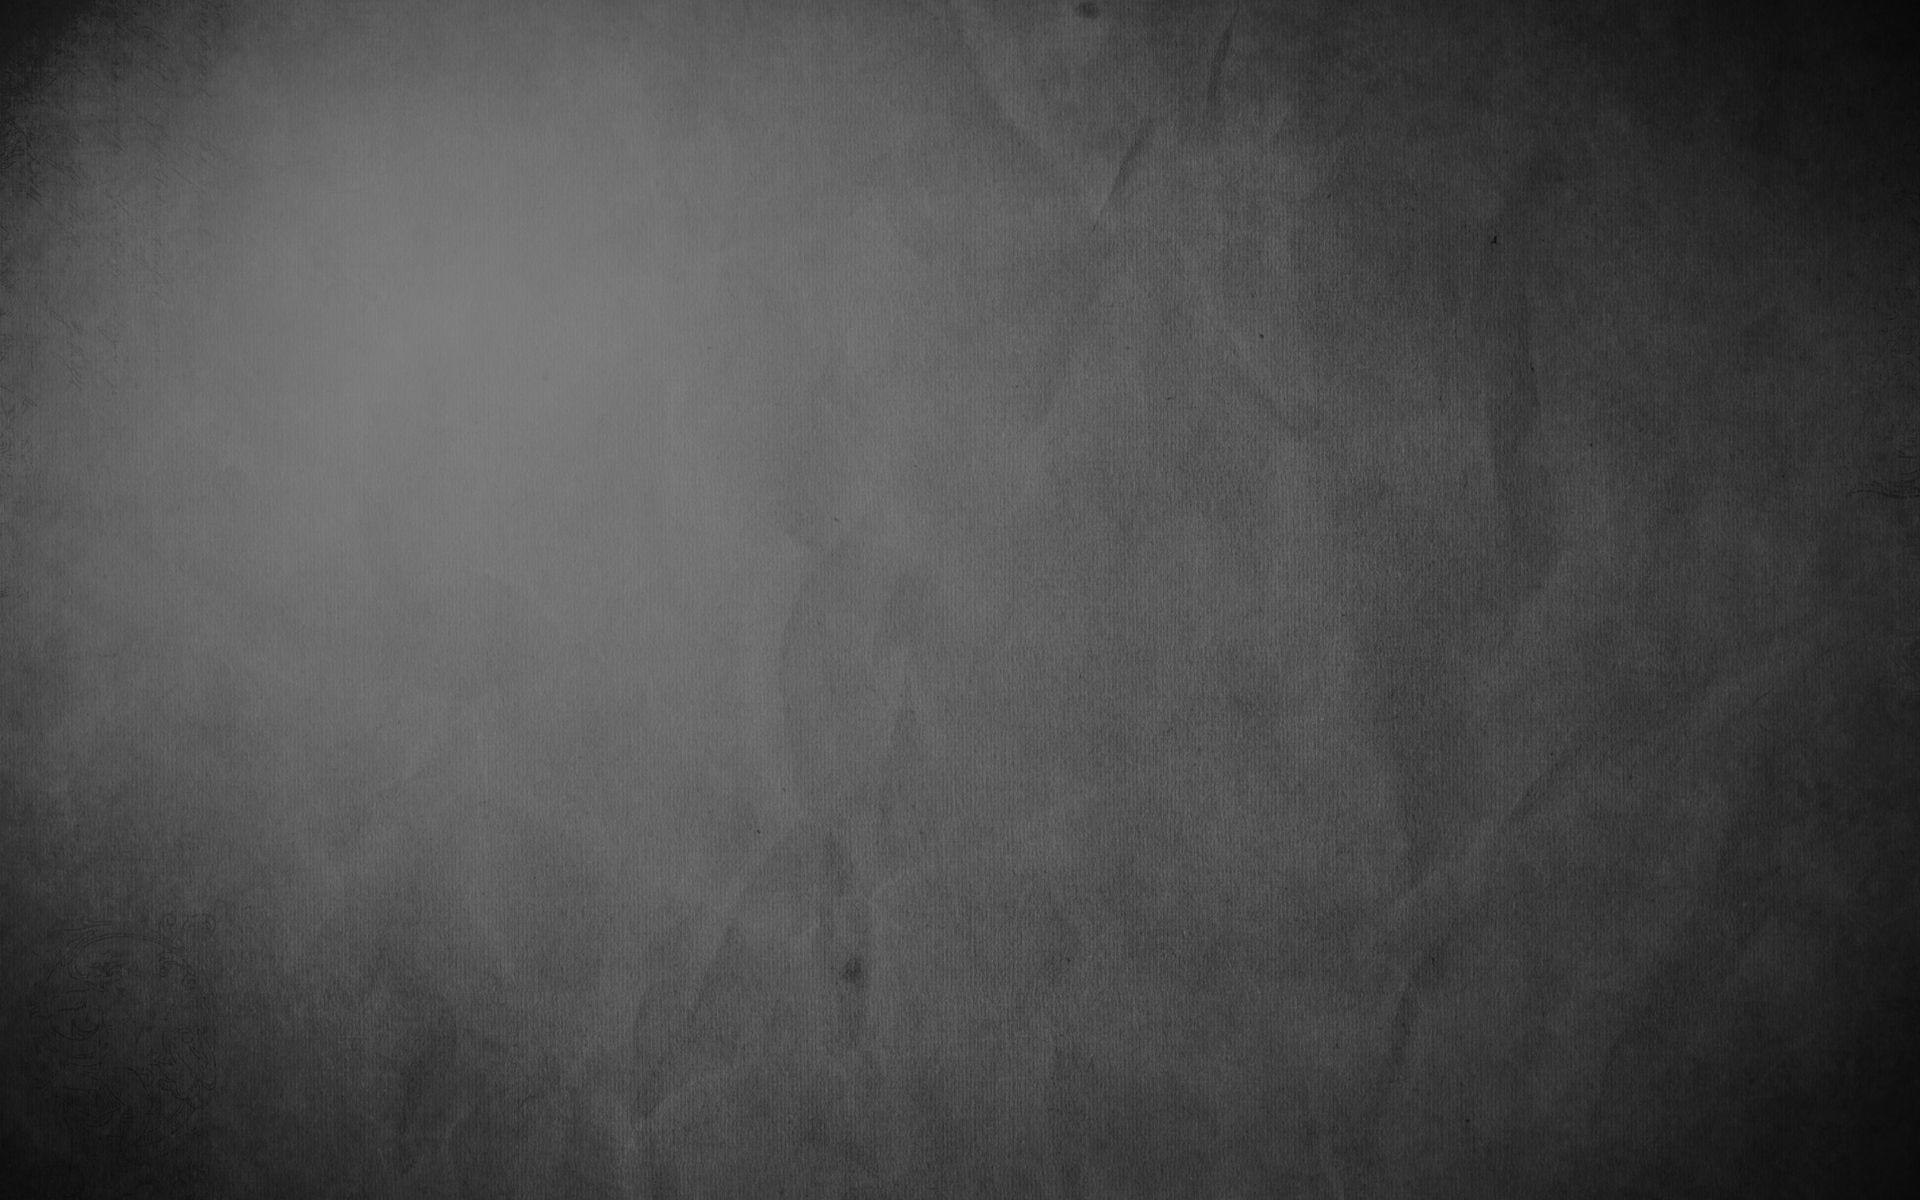 19  tumblr grunge backgrounds  u00b7 u2460 download free cool high resolution wallpapers for desktop